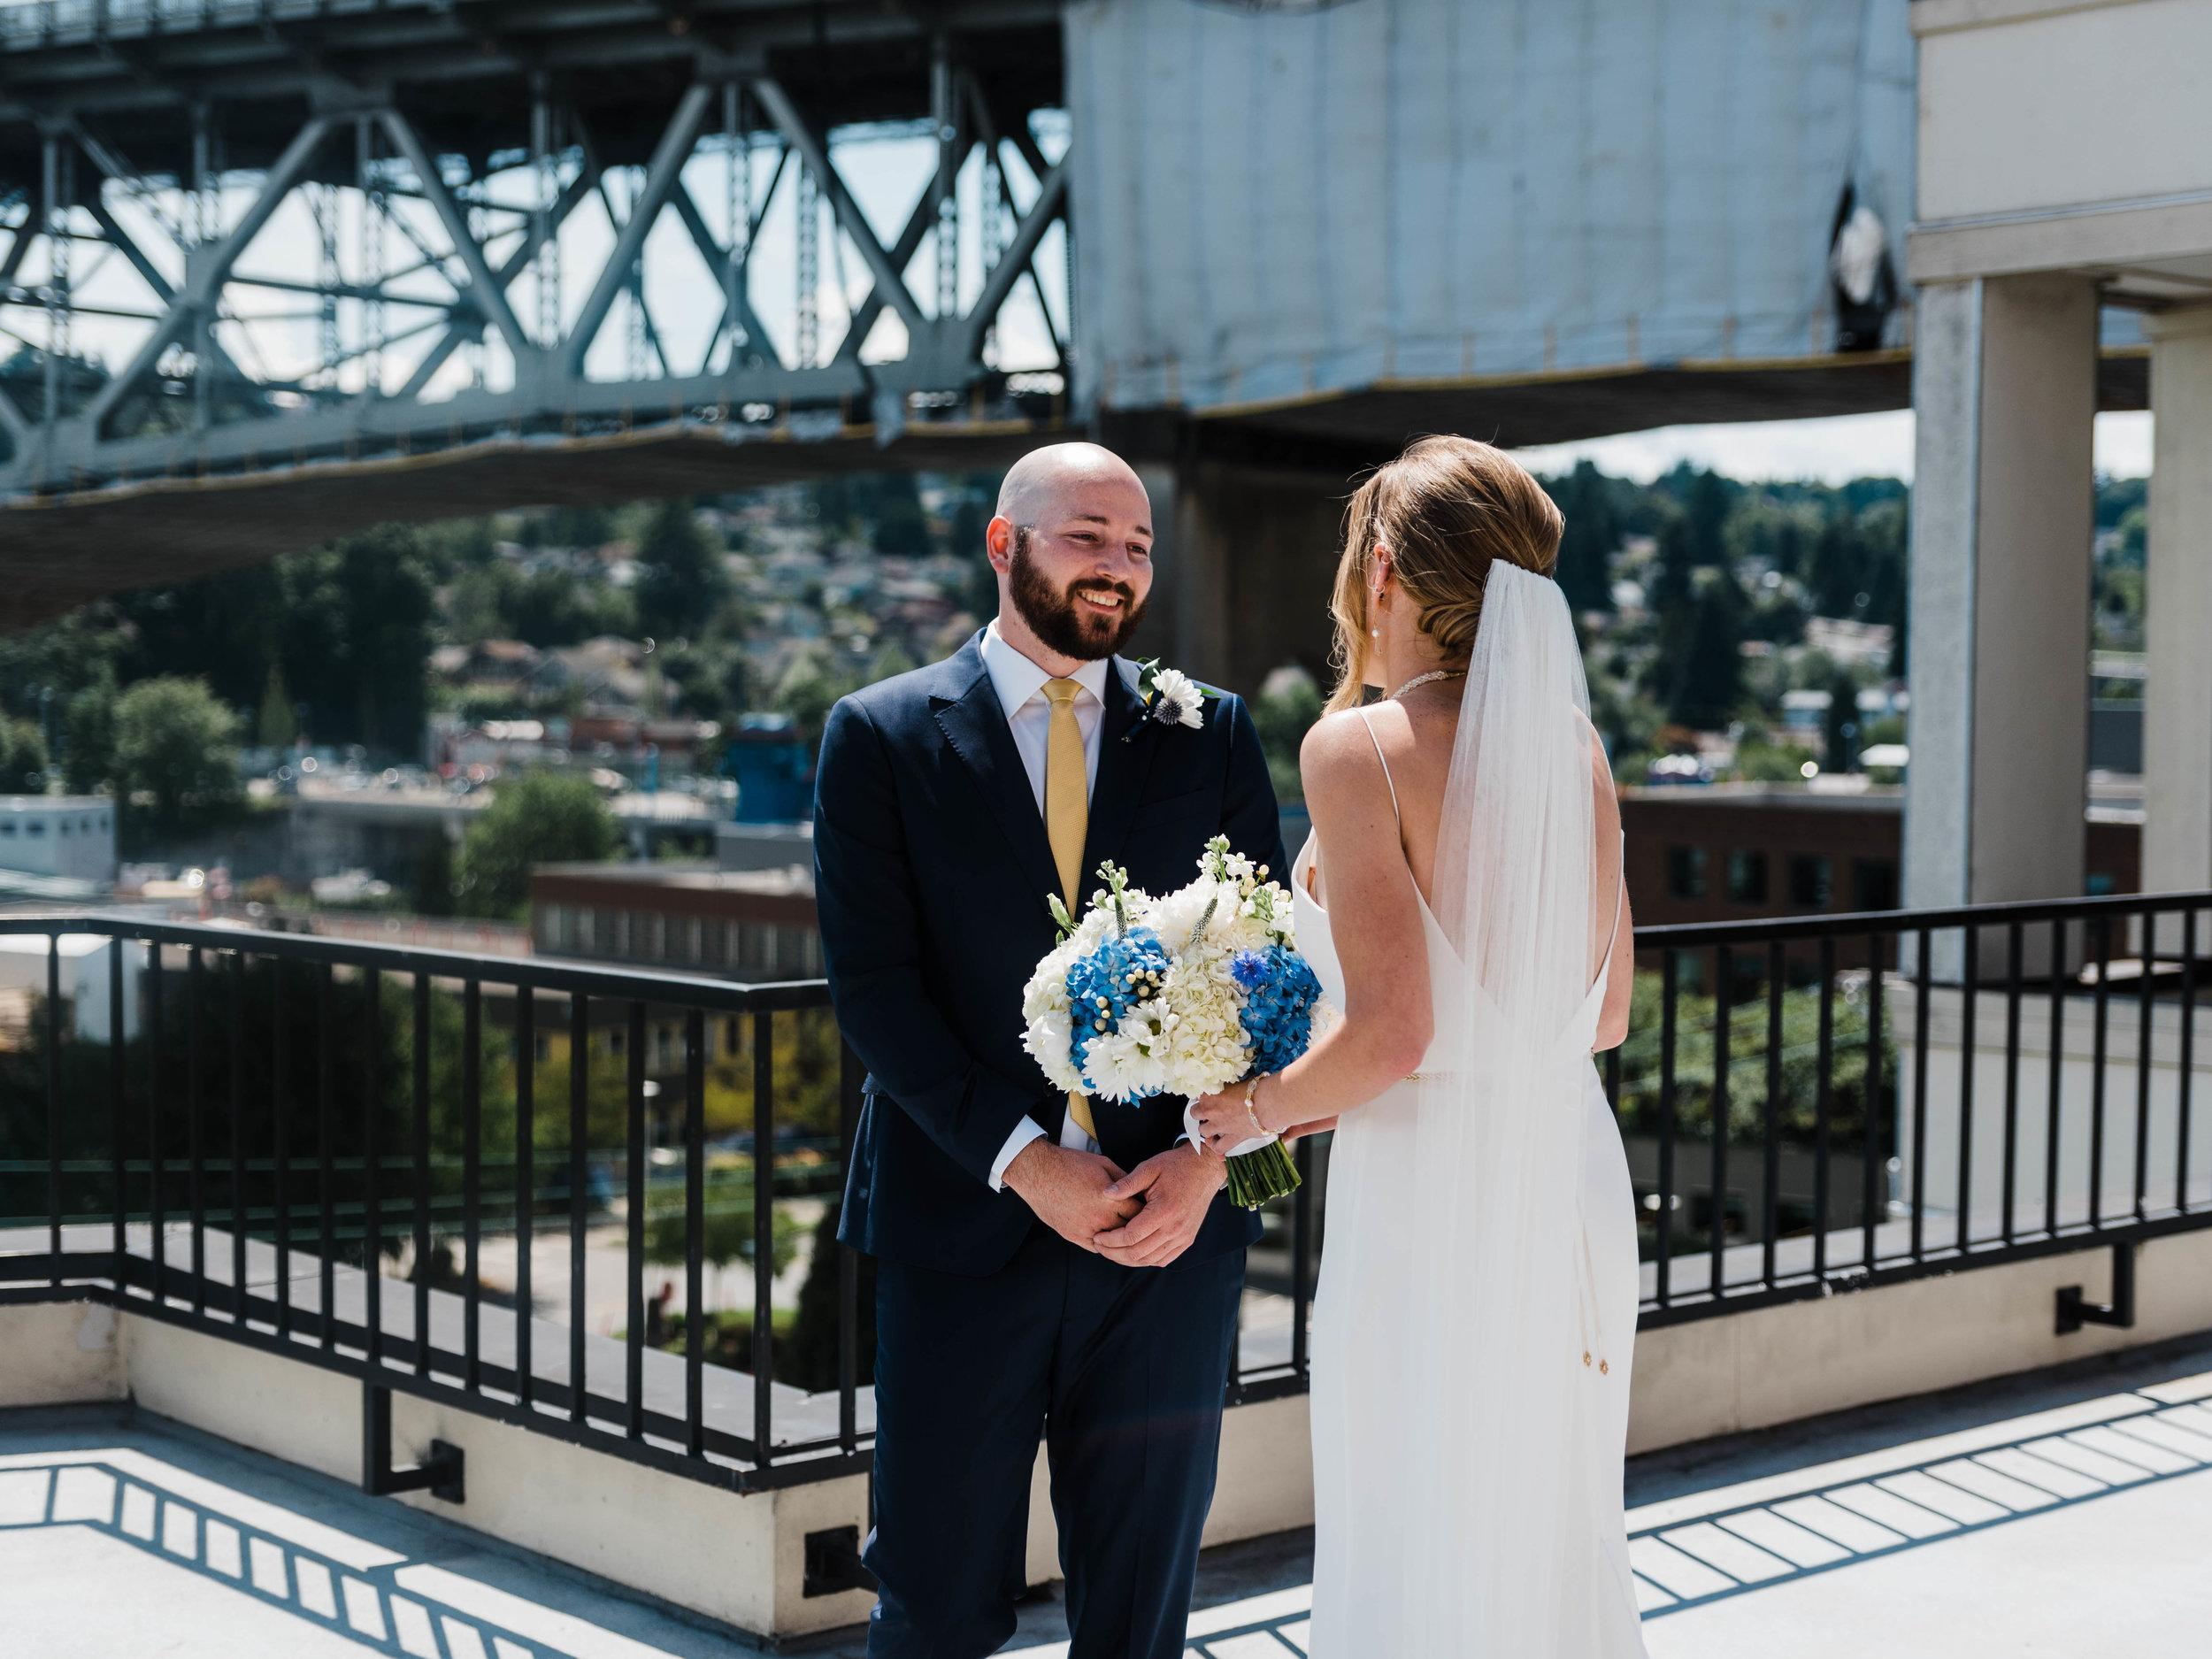 Seattle Wedding- MV Skansonia - Anna + Josh -  (302) - Copy.jpg